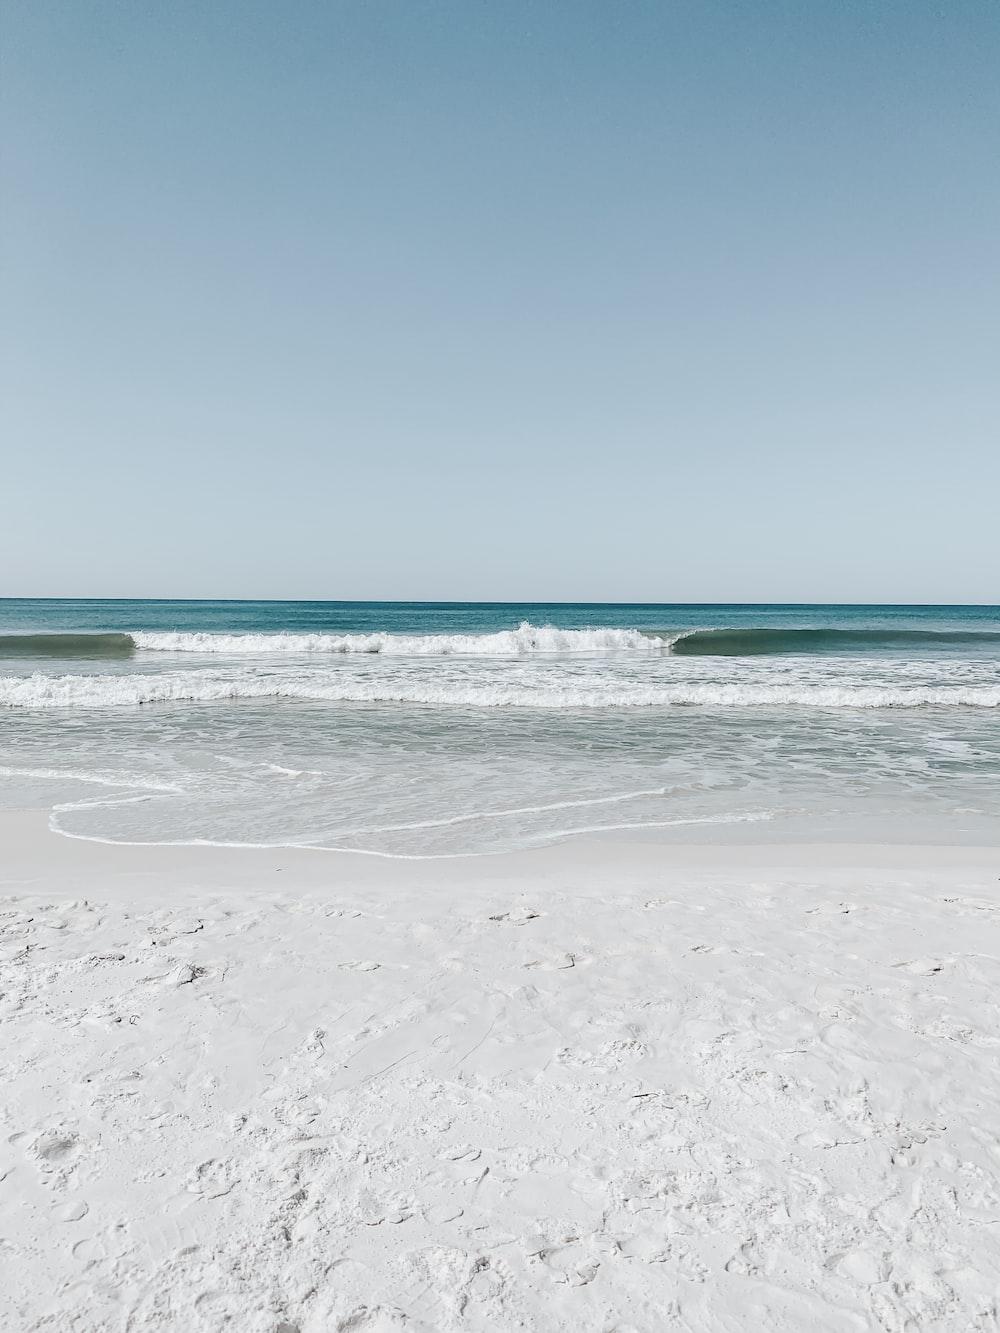 white sand beach under clear blue sky